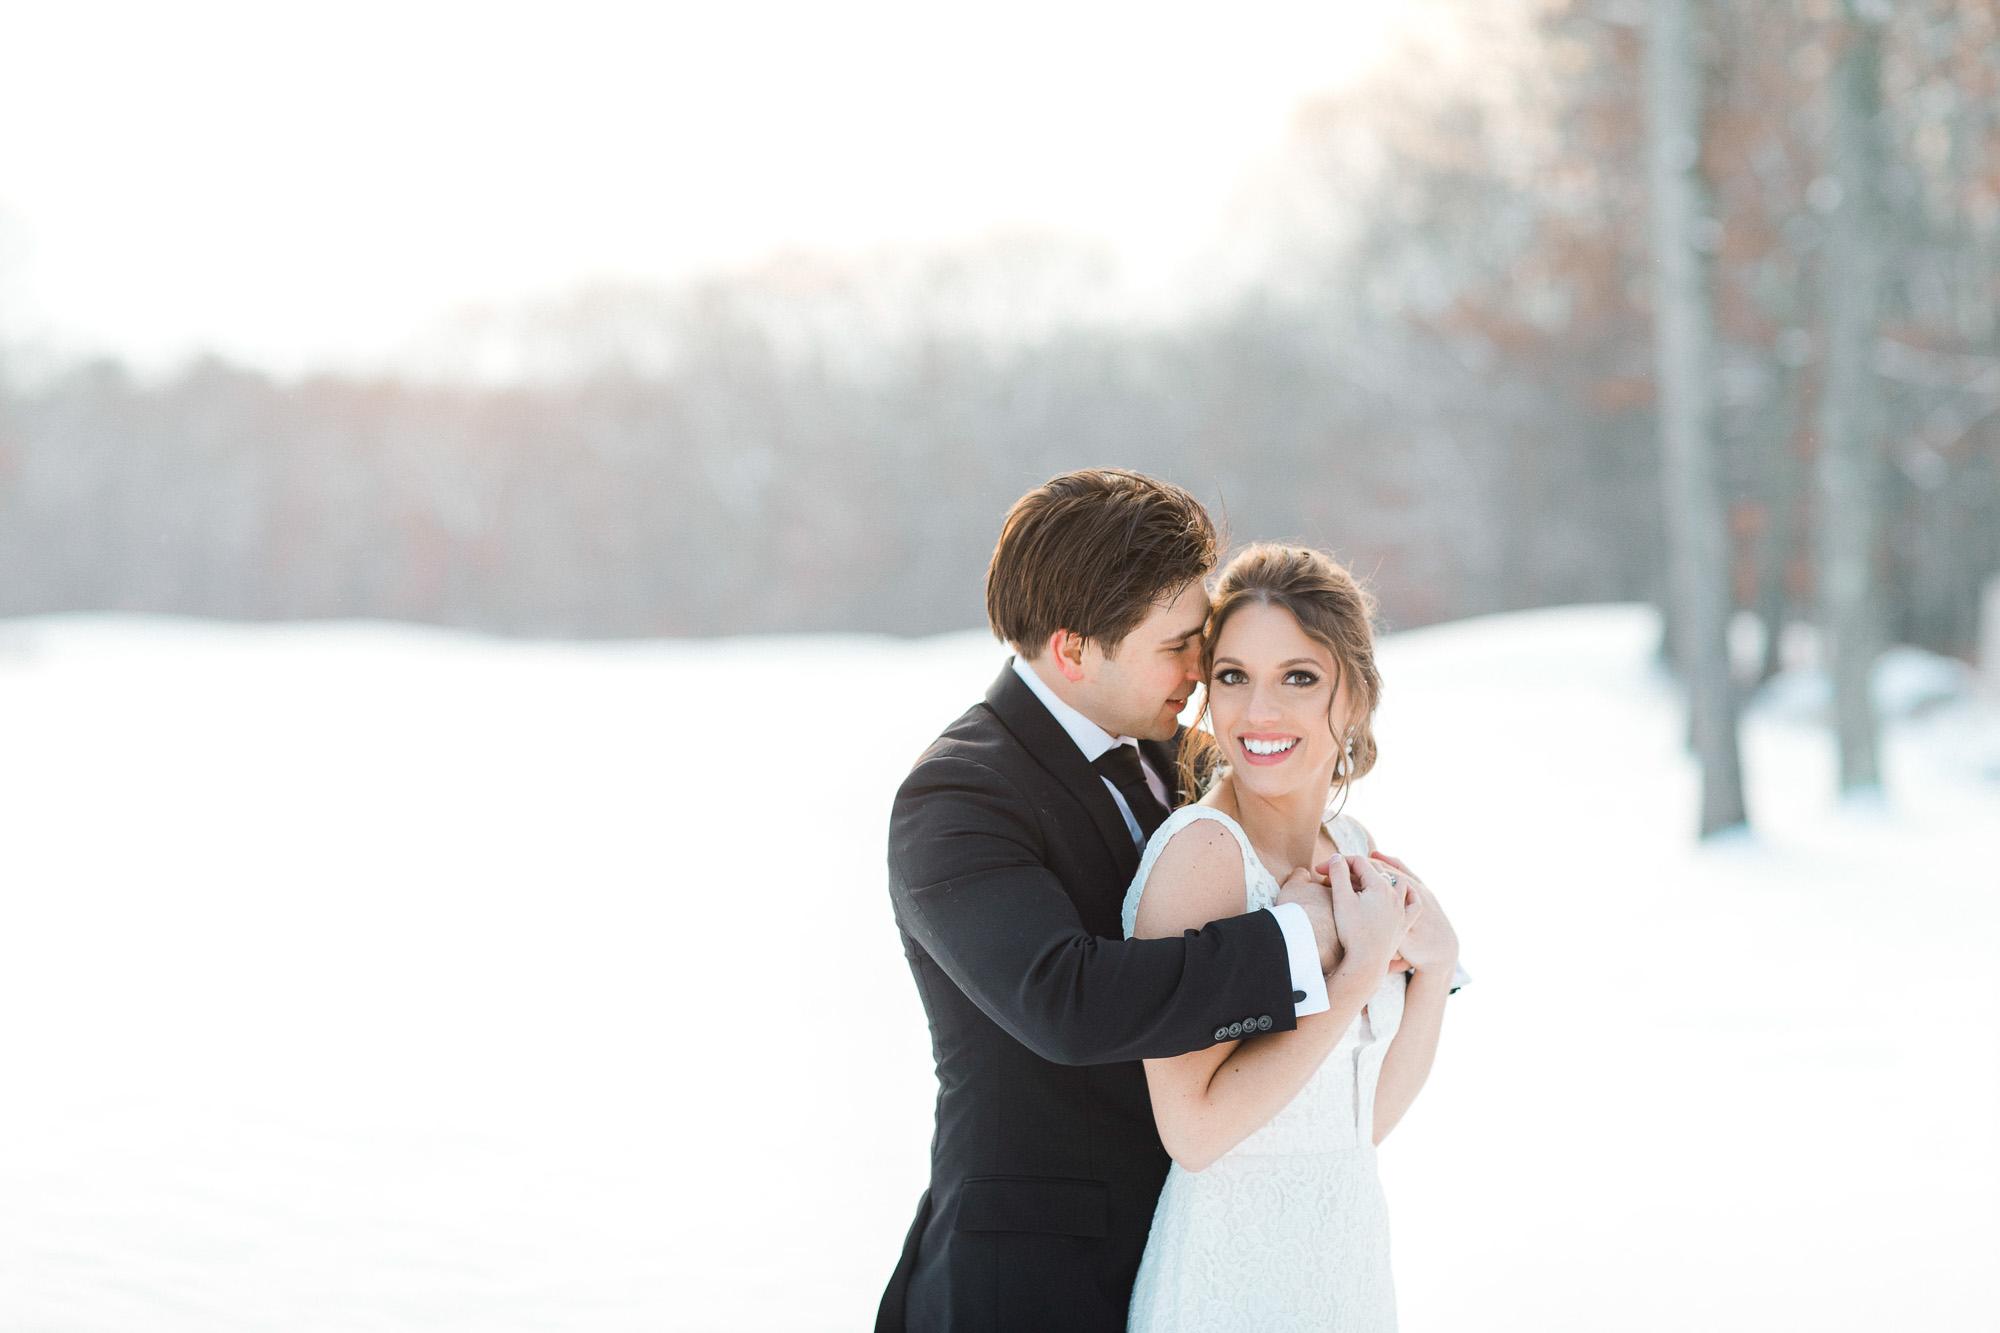 snowy-sand-springs-country-club-drums-pa-christmas-wedding-24891.jpg